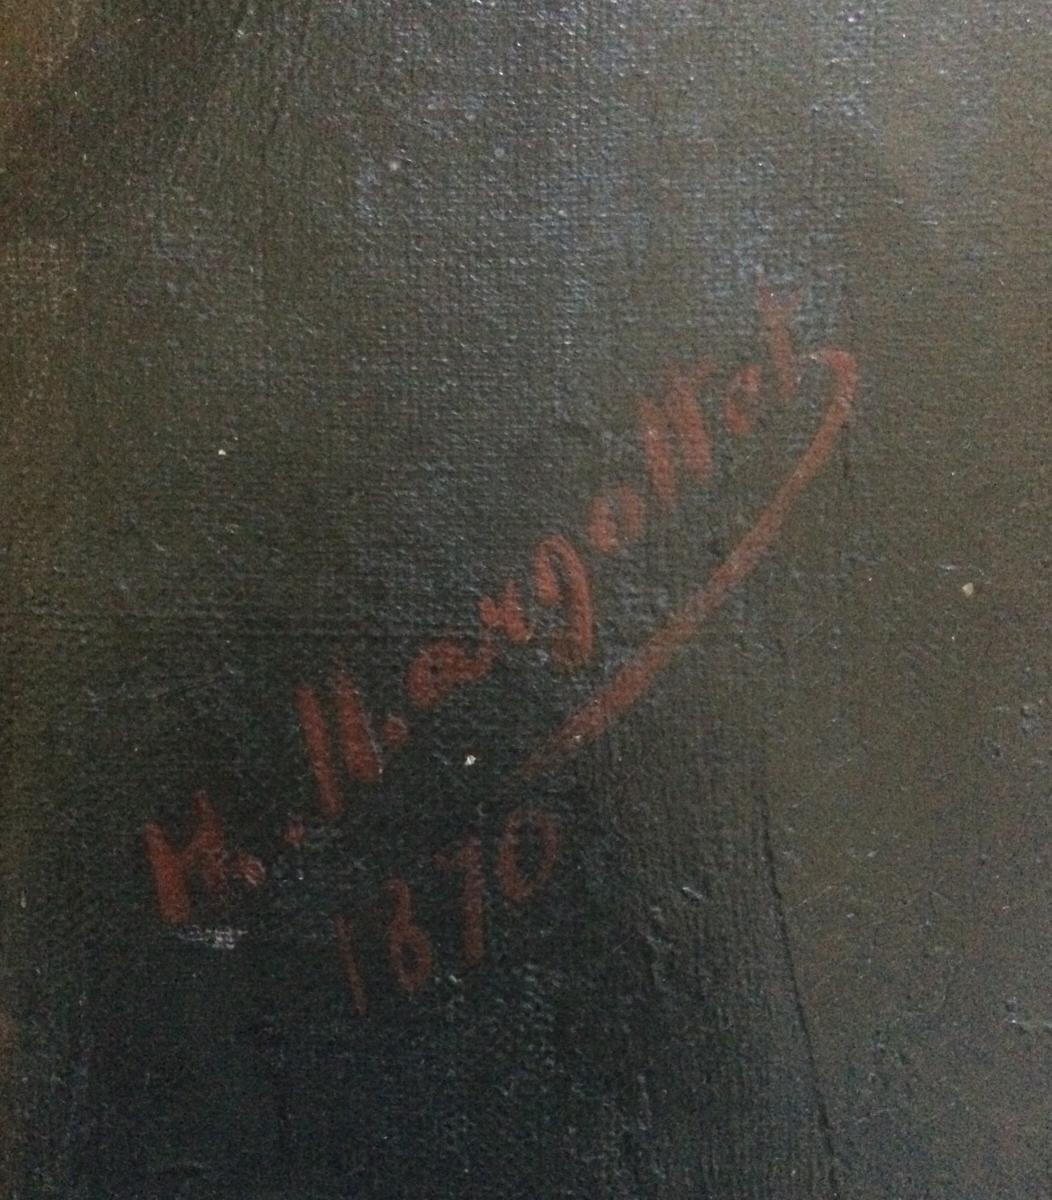 Edouard Hippolyte Margottet,1848-1887, Portrait 100 Cm X 81 Cm-photo-1